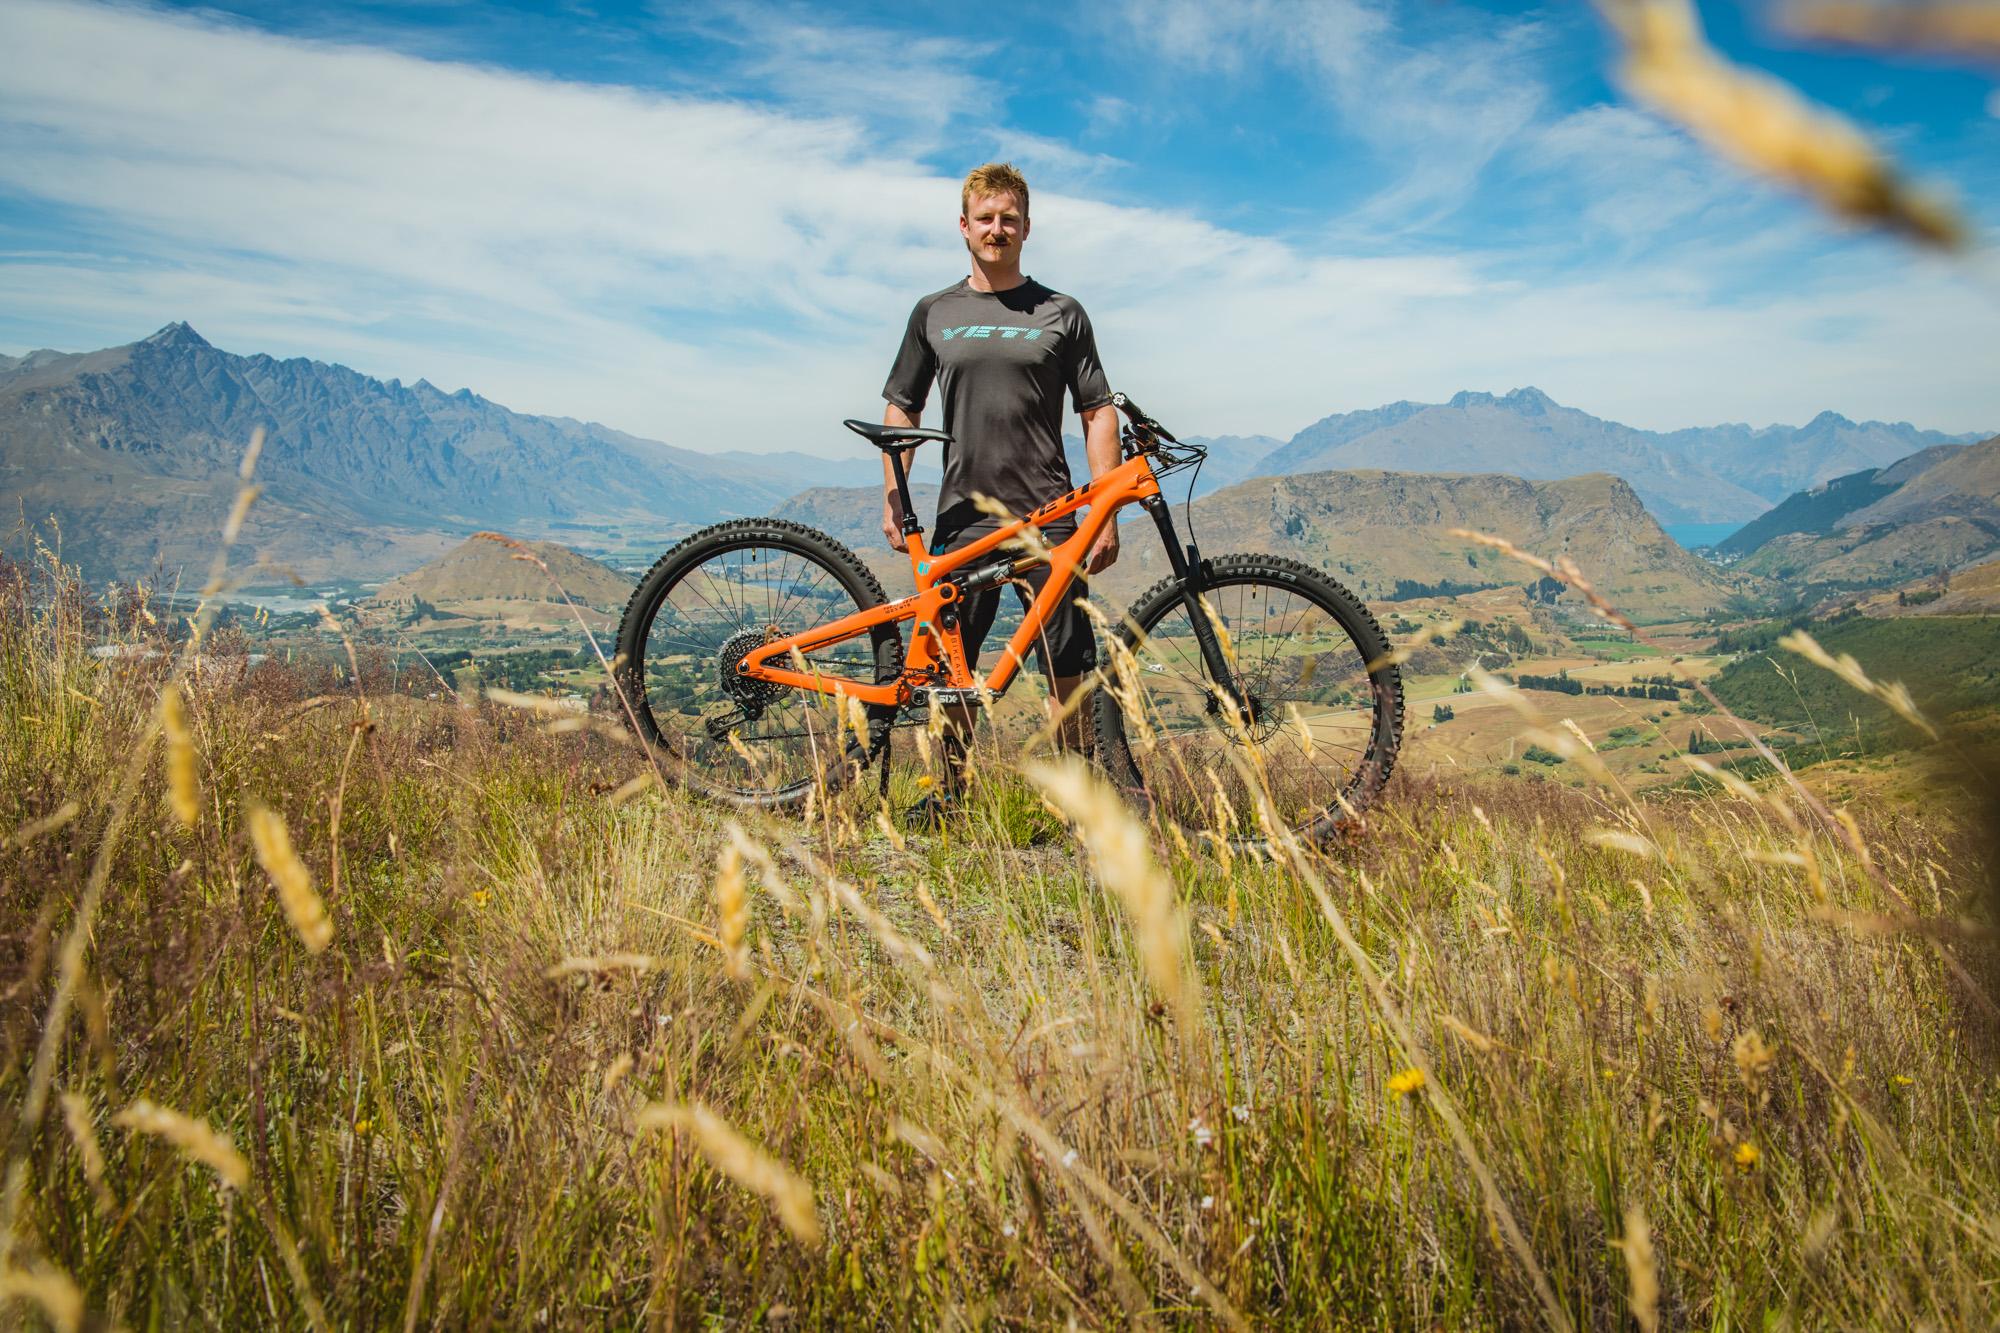 Jimmy Pollard - Bike check 2019 Yeti SB150